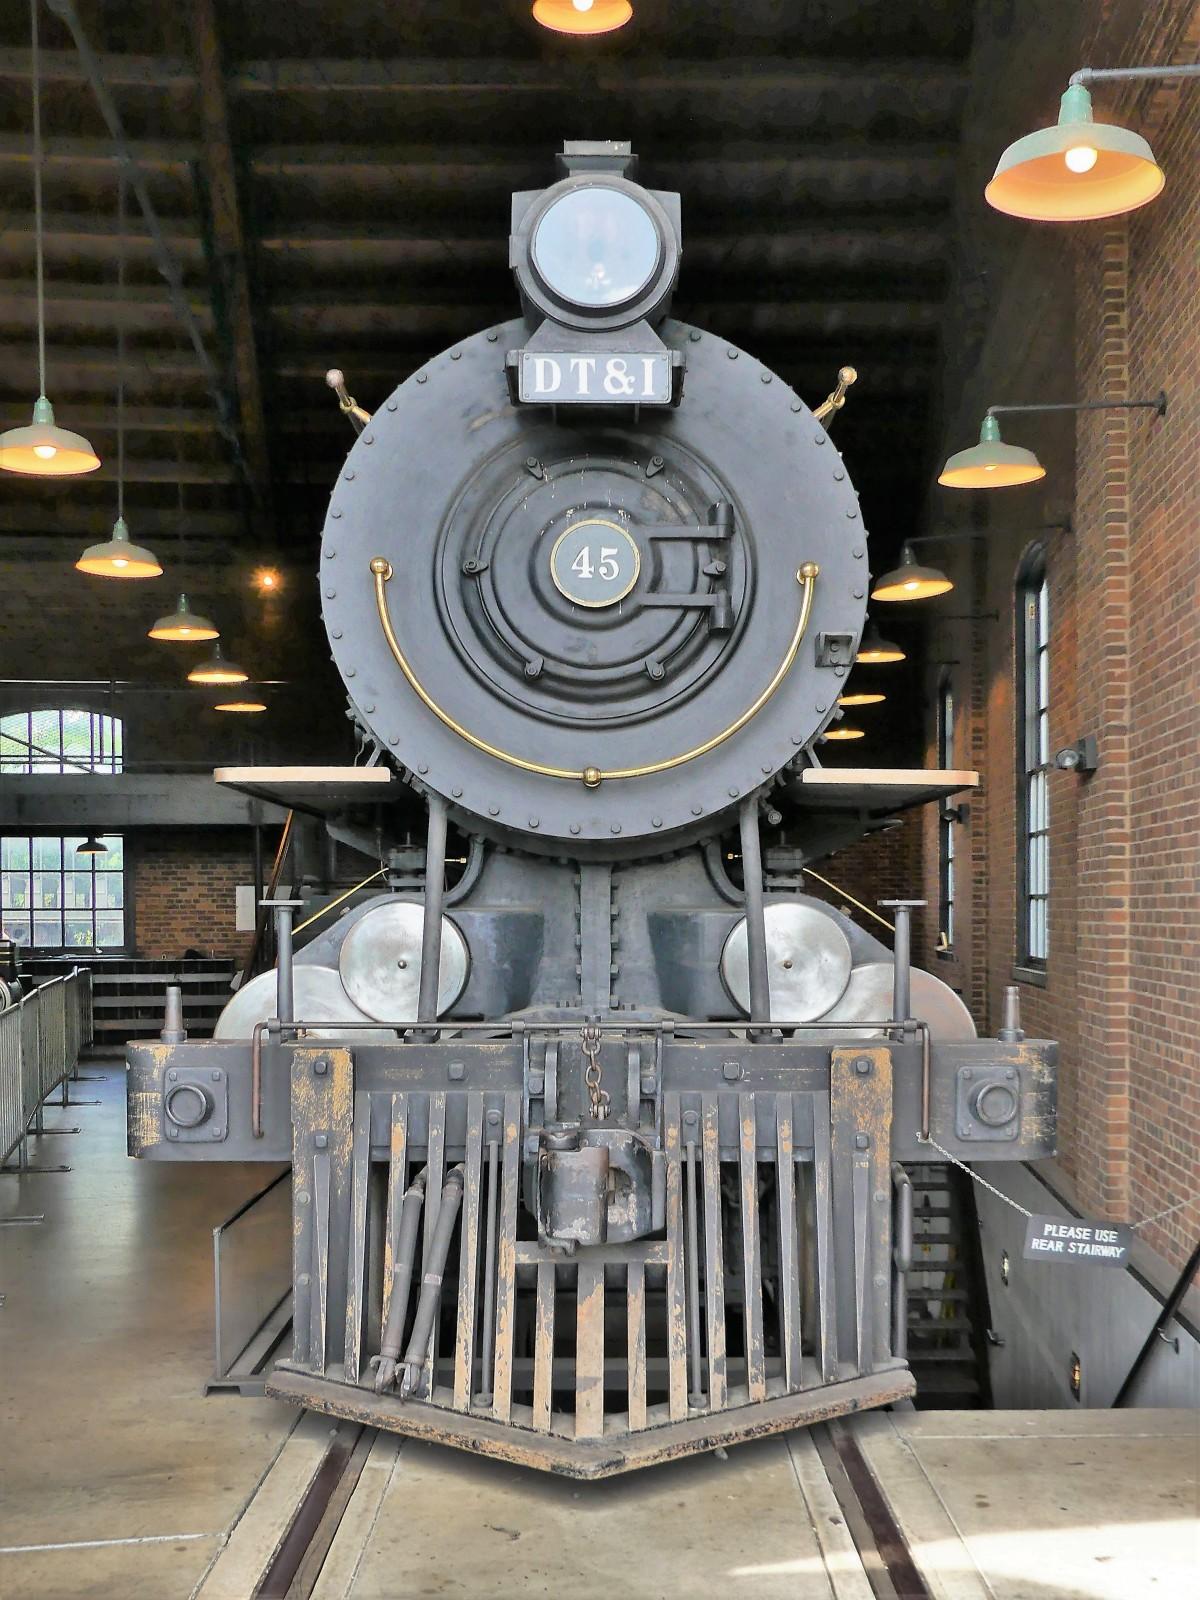 Engine 45